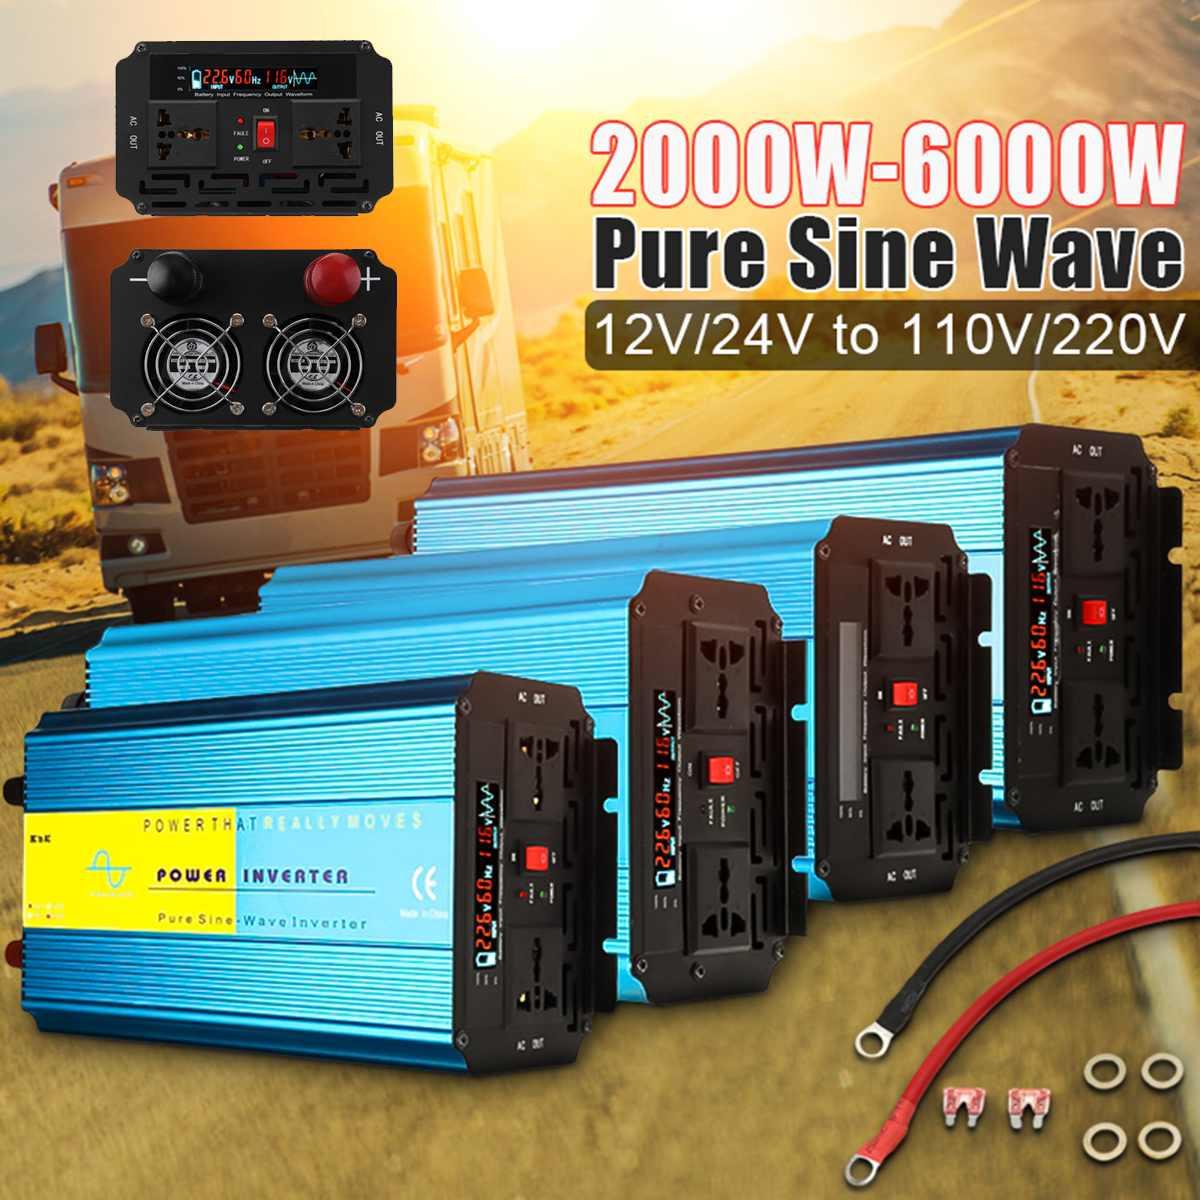 Driver Electronics Powerguru Power Electronics Information Portal